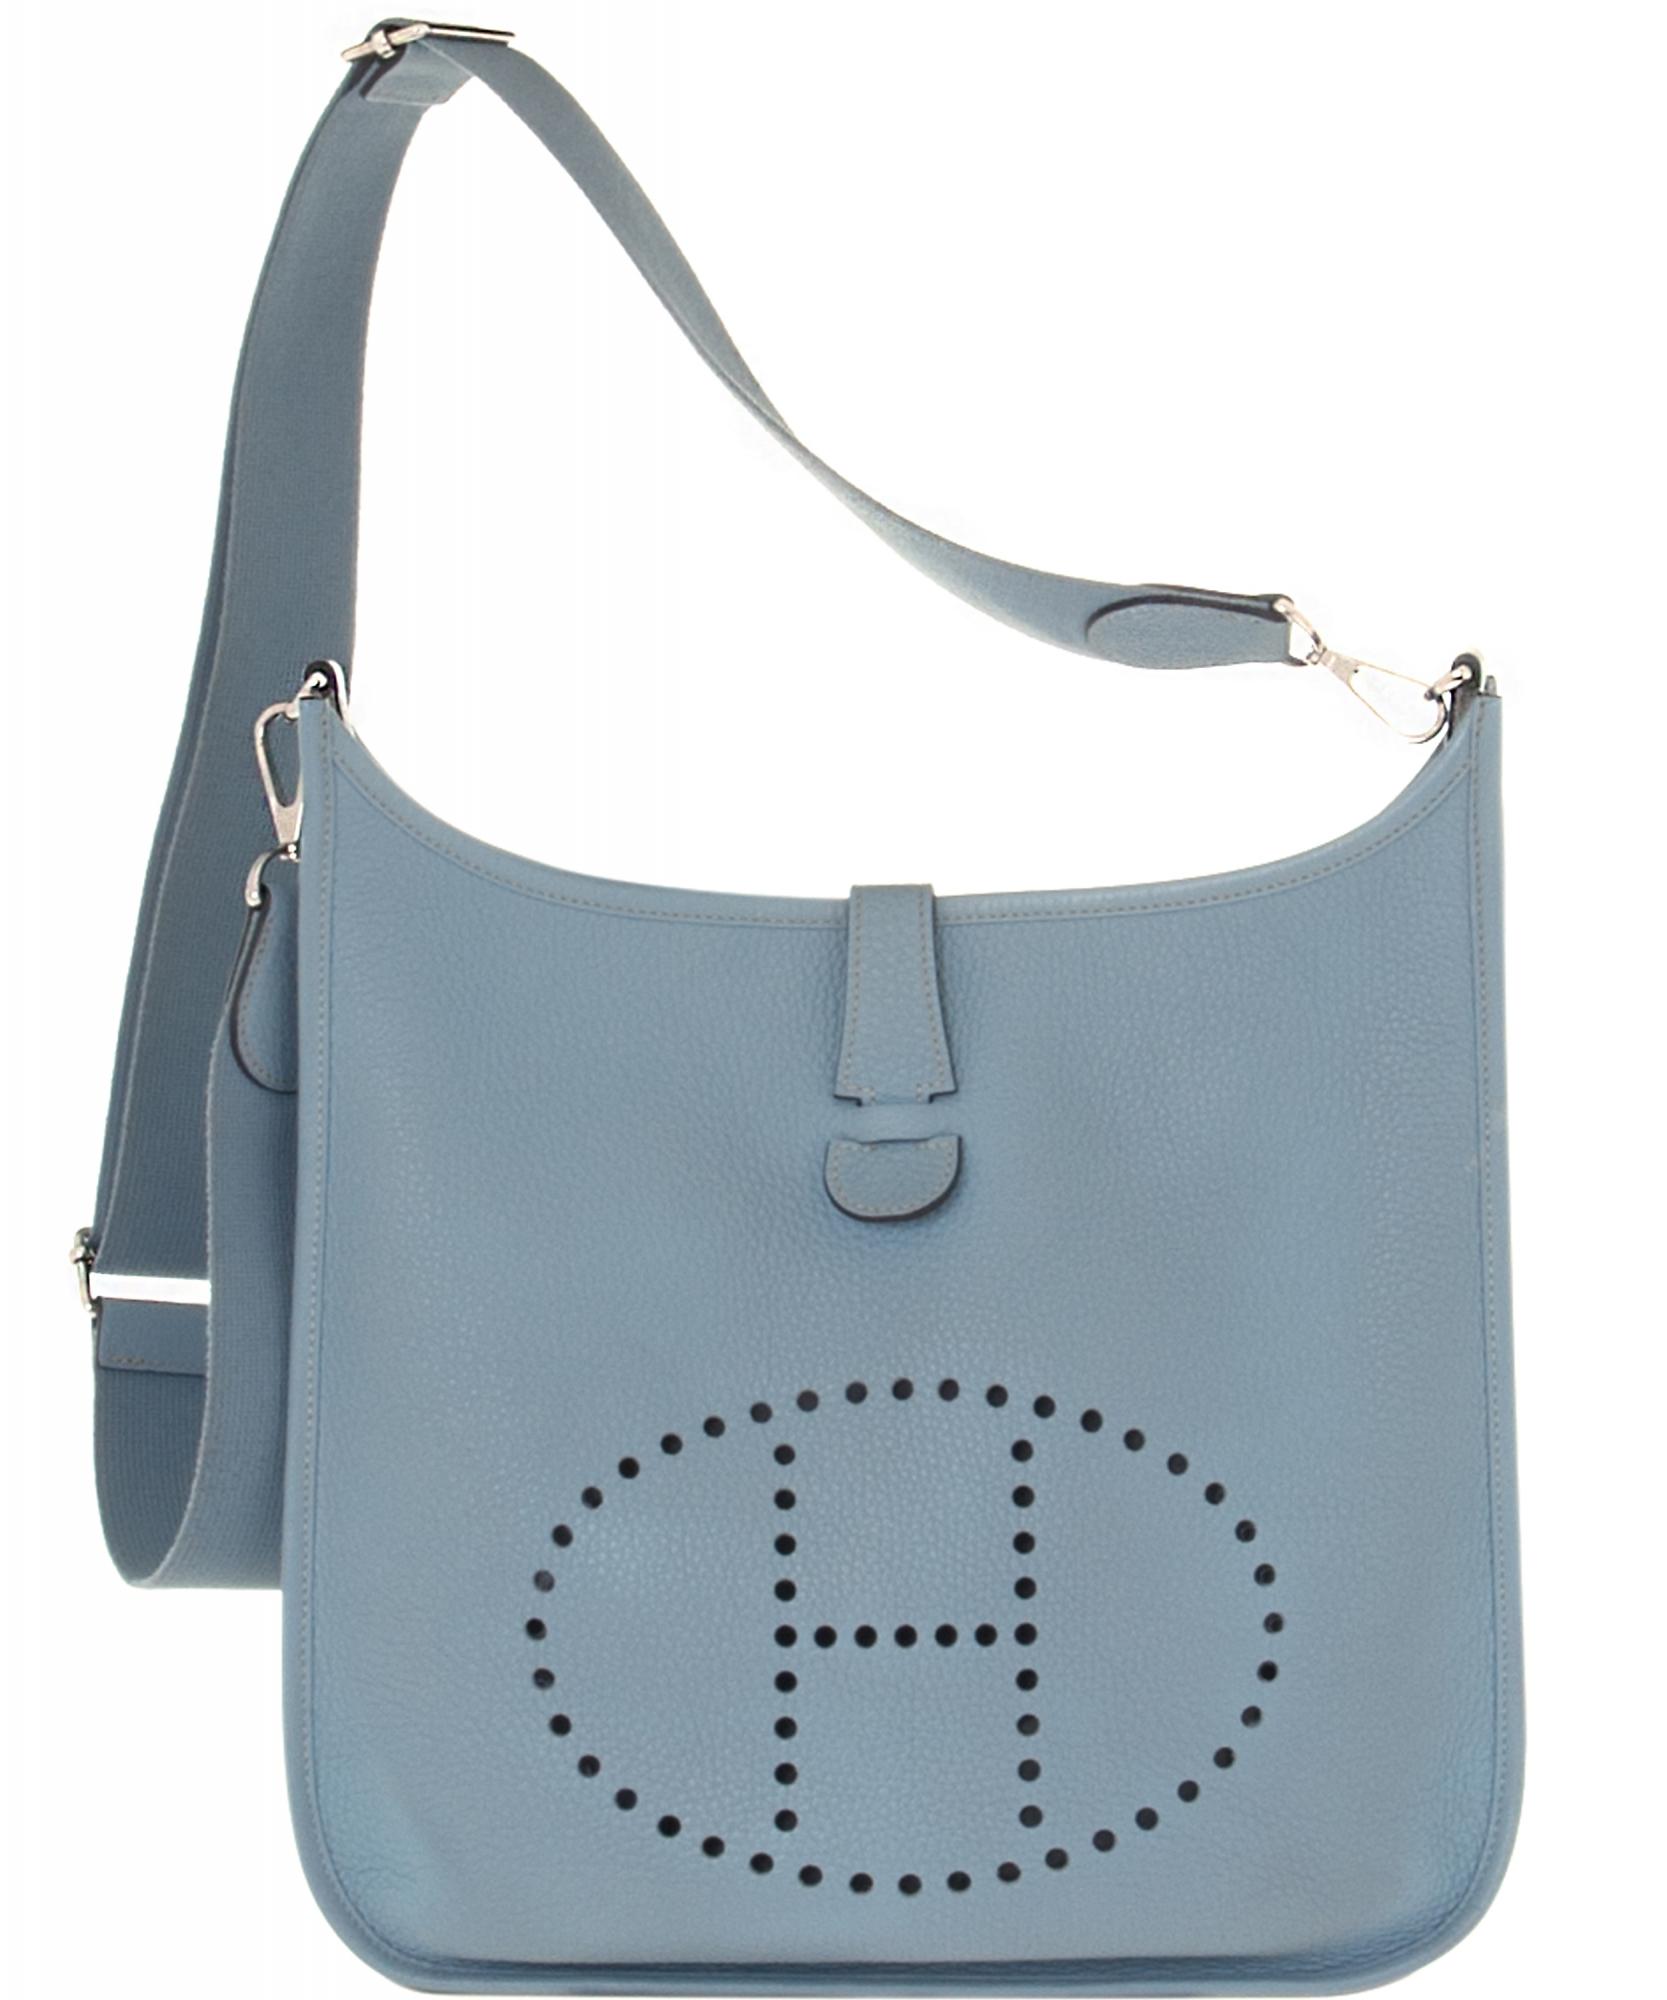 719887cb61f6 ... switzerland hermès ciel blue evelyne iii 33 bag. tap to expand bb368  1540b